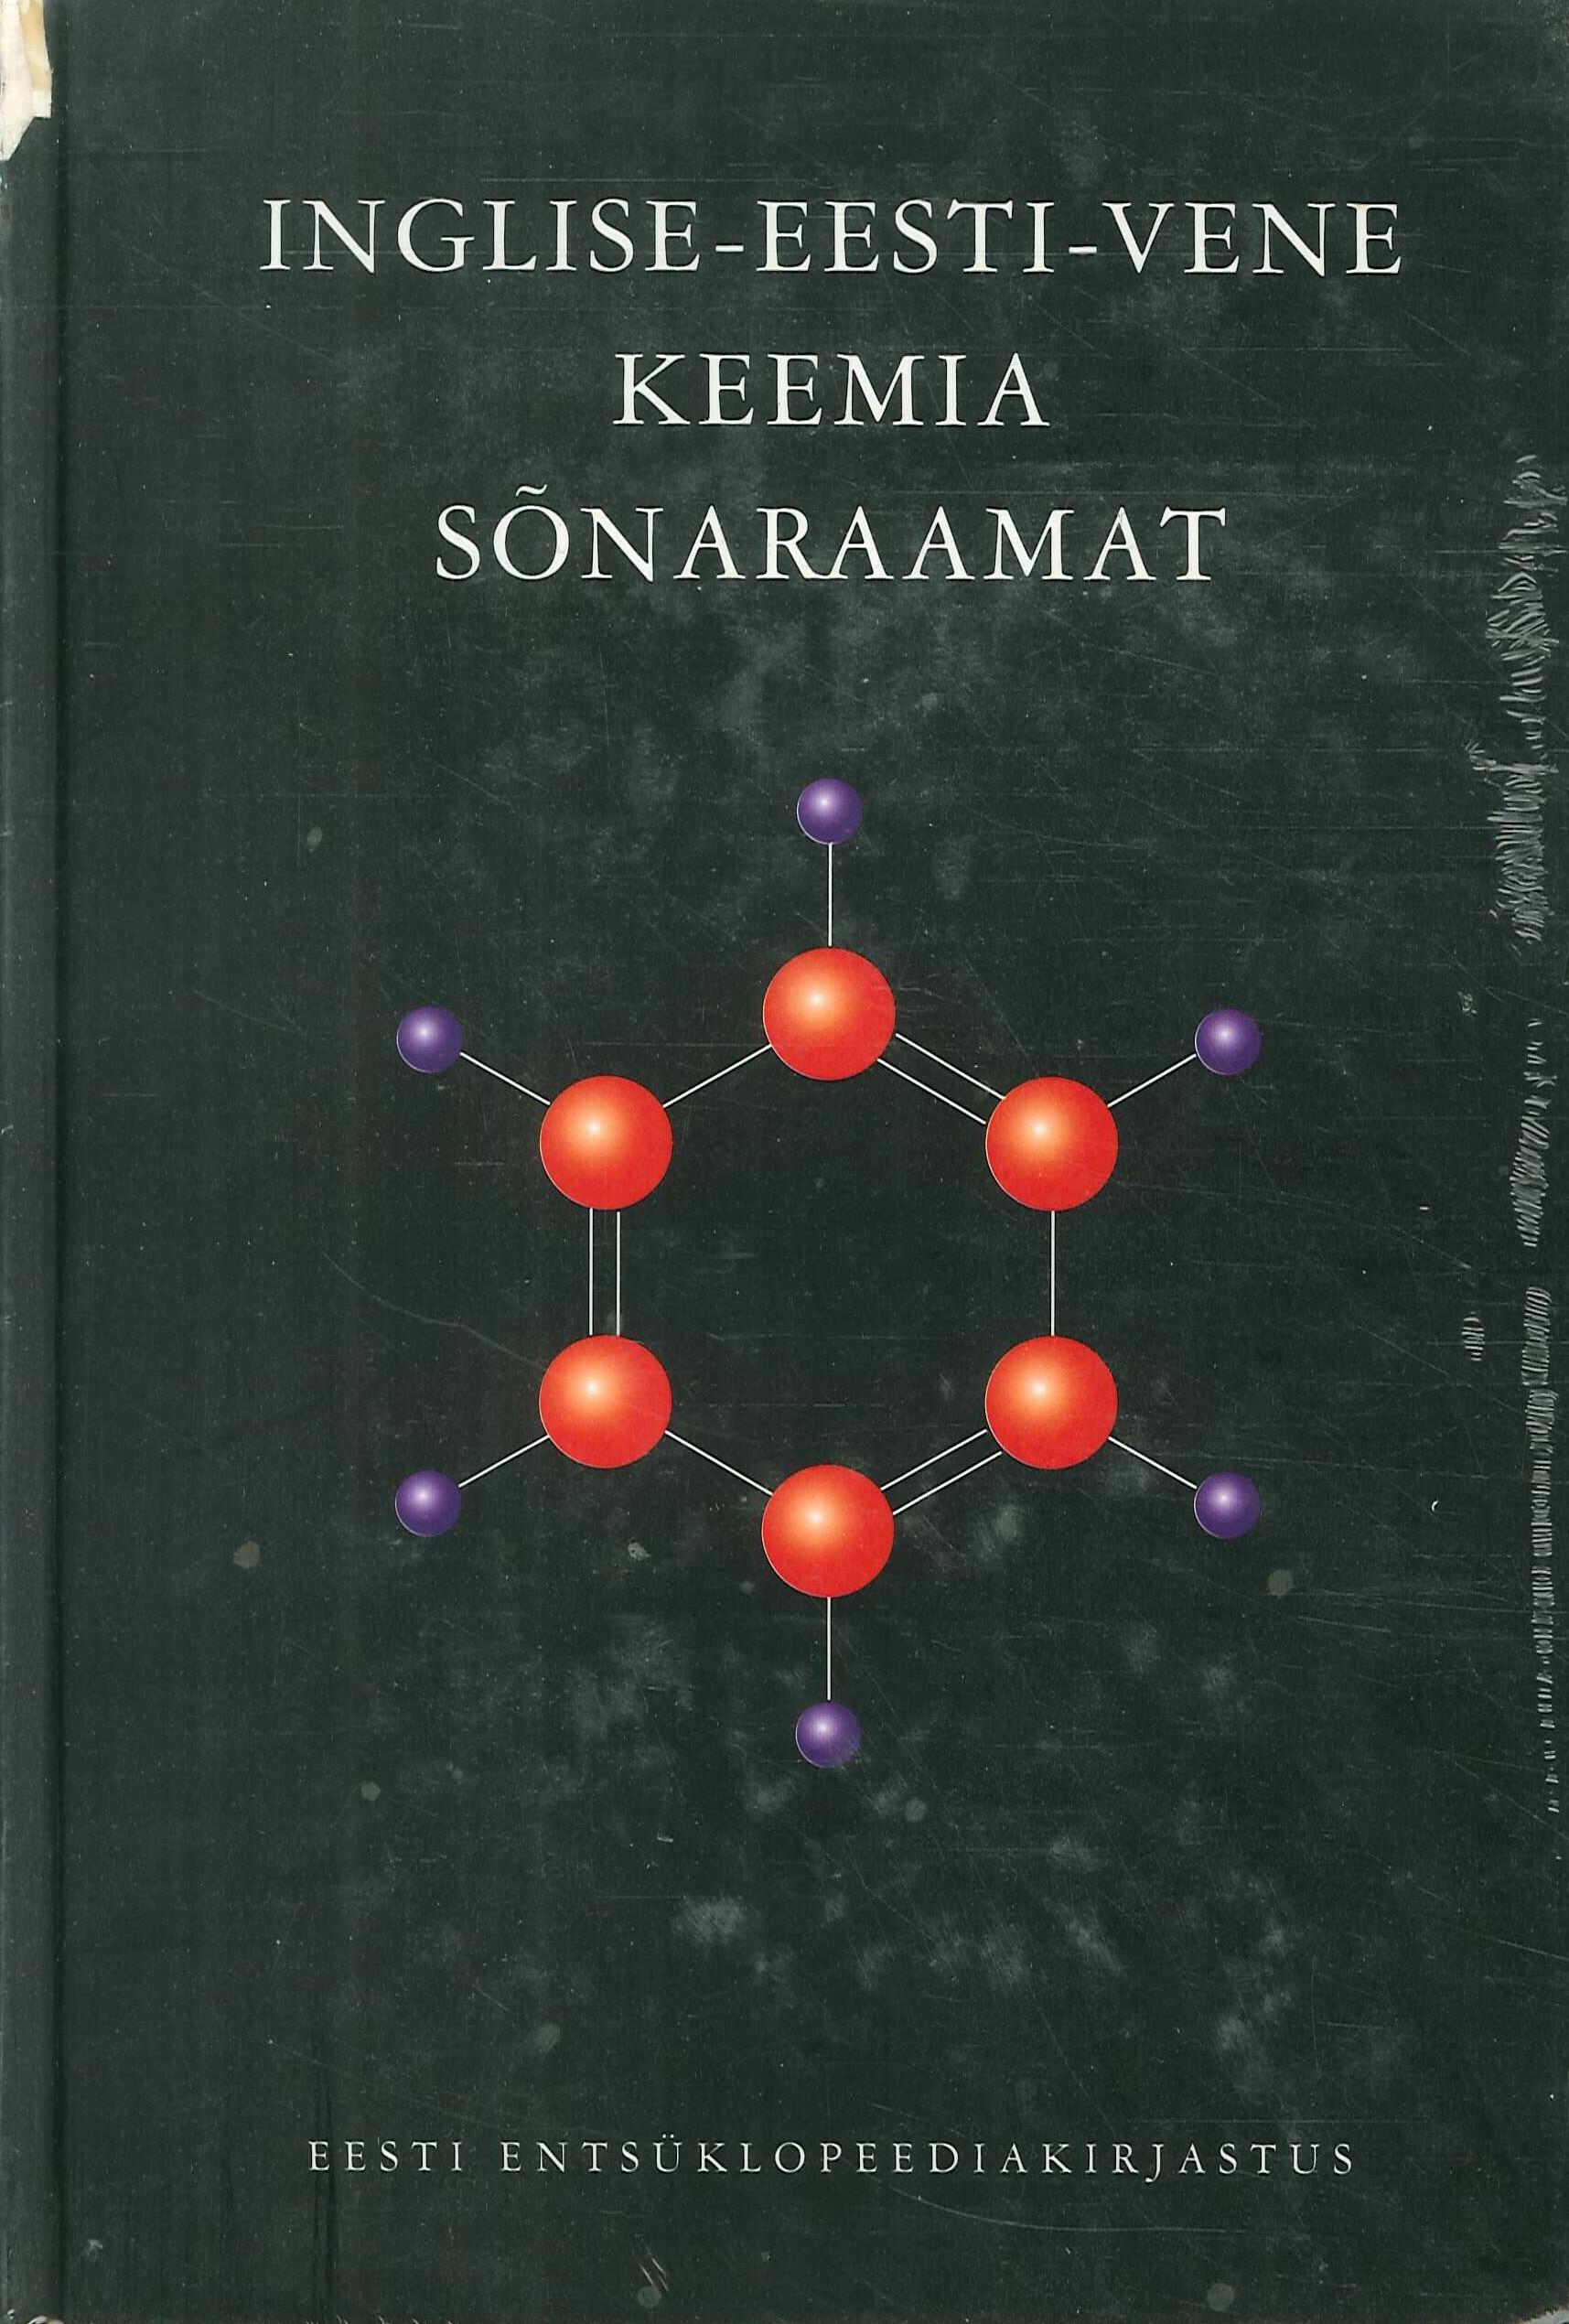 Inglise-eesti-vene keemia sõnaraamat. English-Estonian-Russian Dictionary of Chemistry